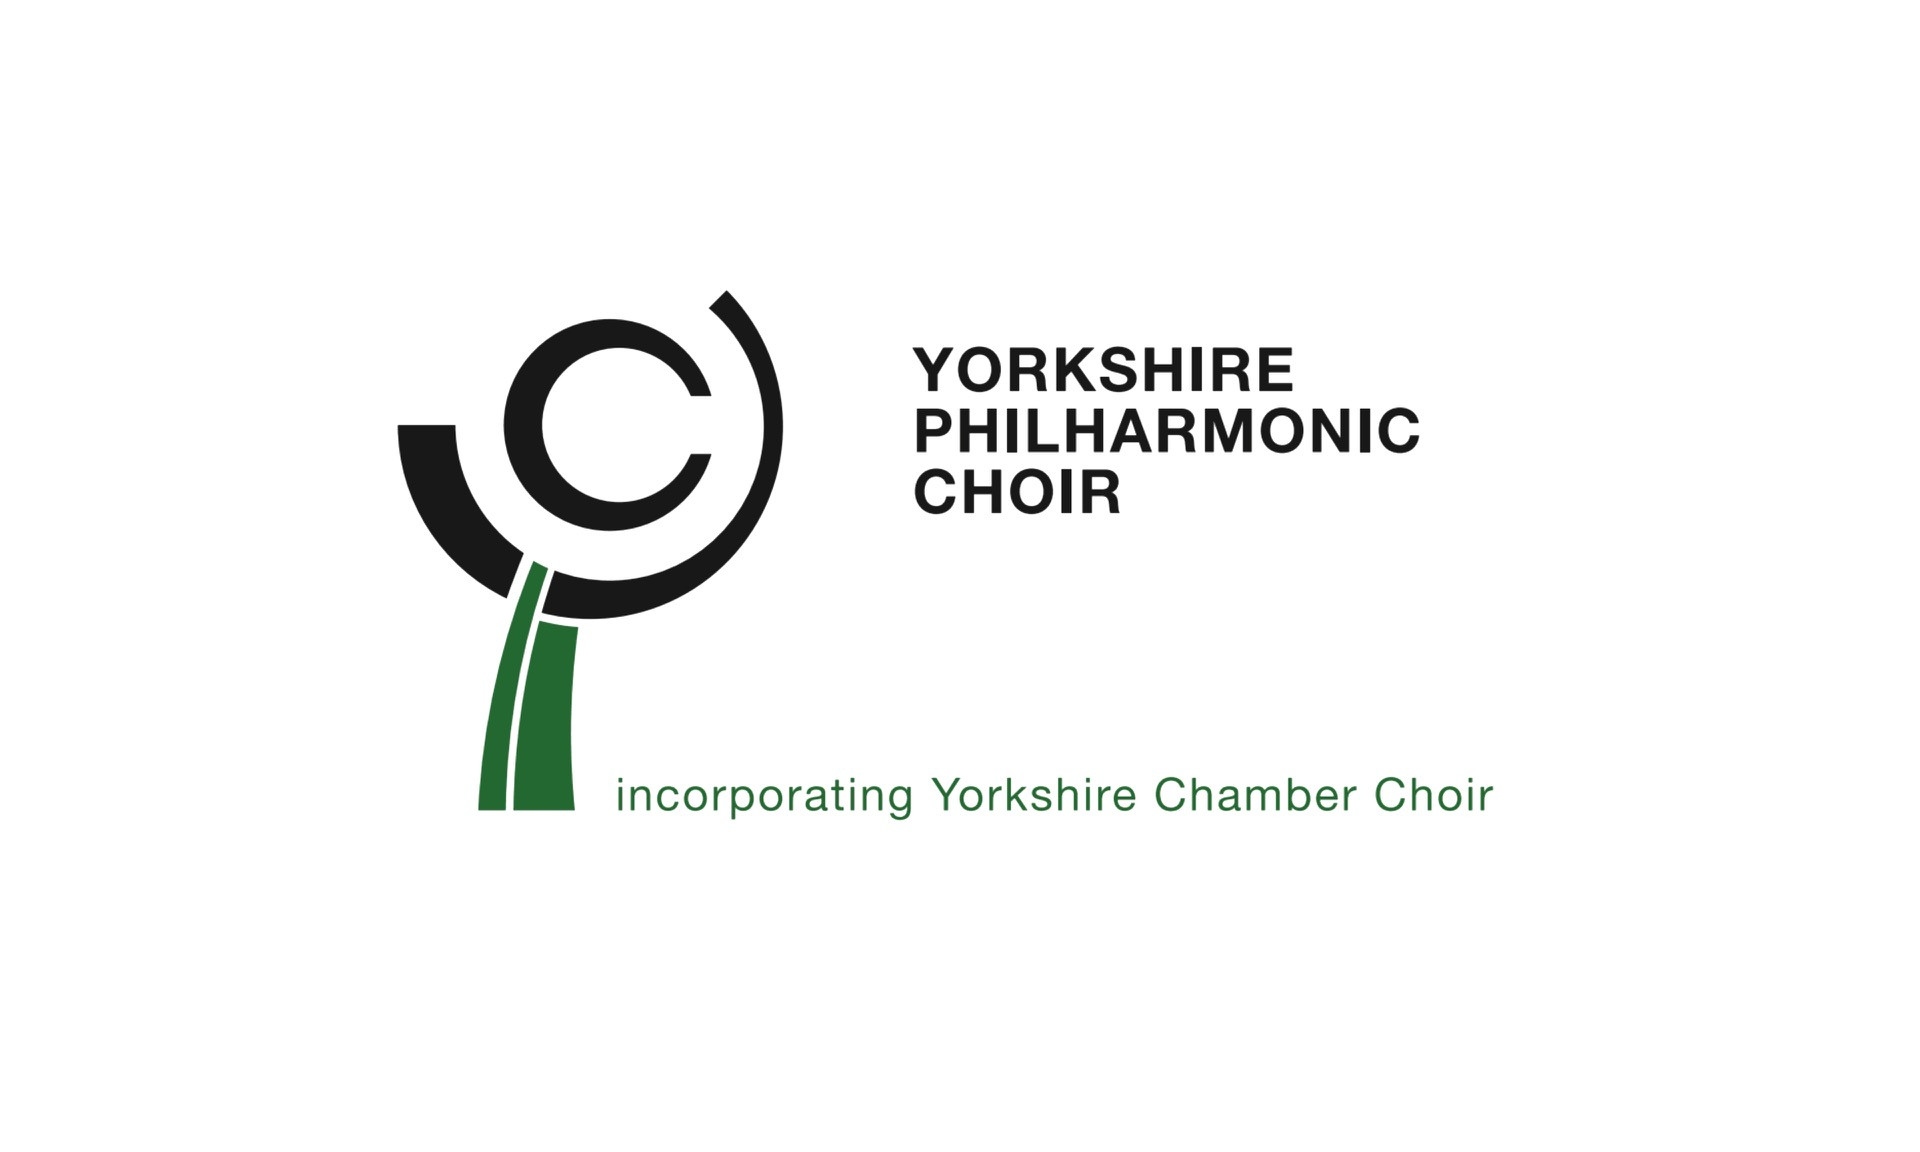 The Choir | Yorkshire Philharmonic Choir